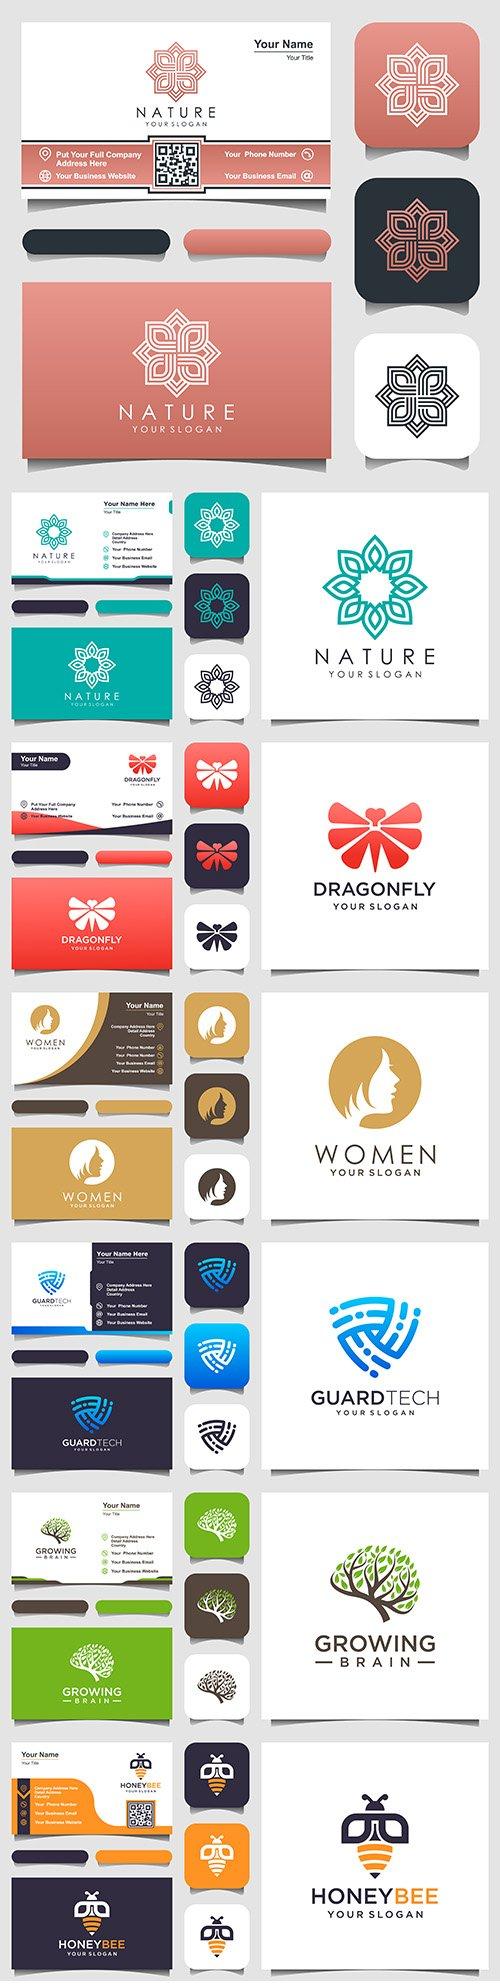 Minimalist elegant logo and business card design 10